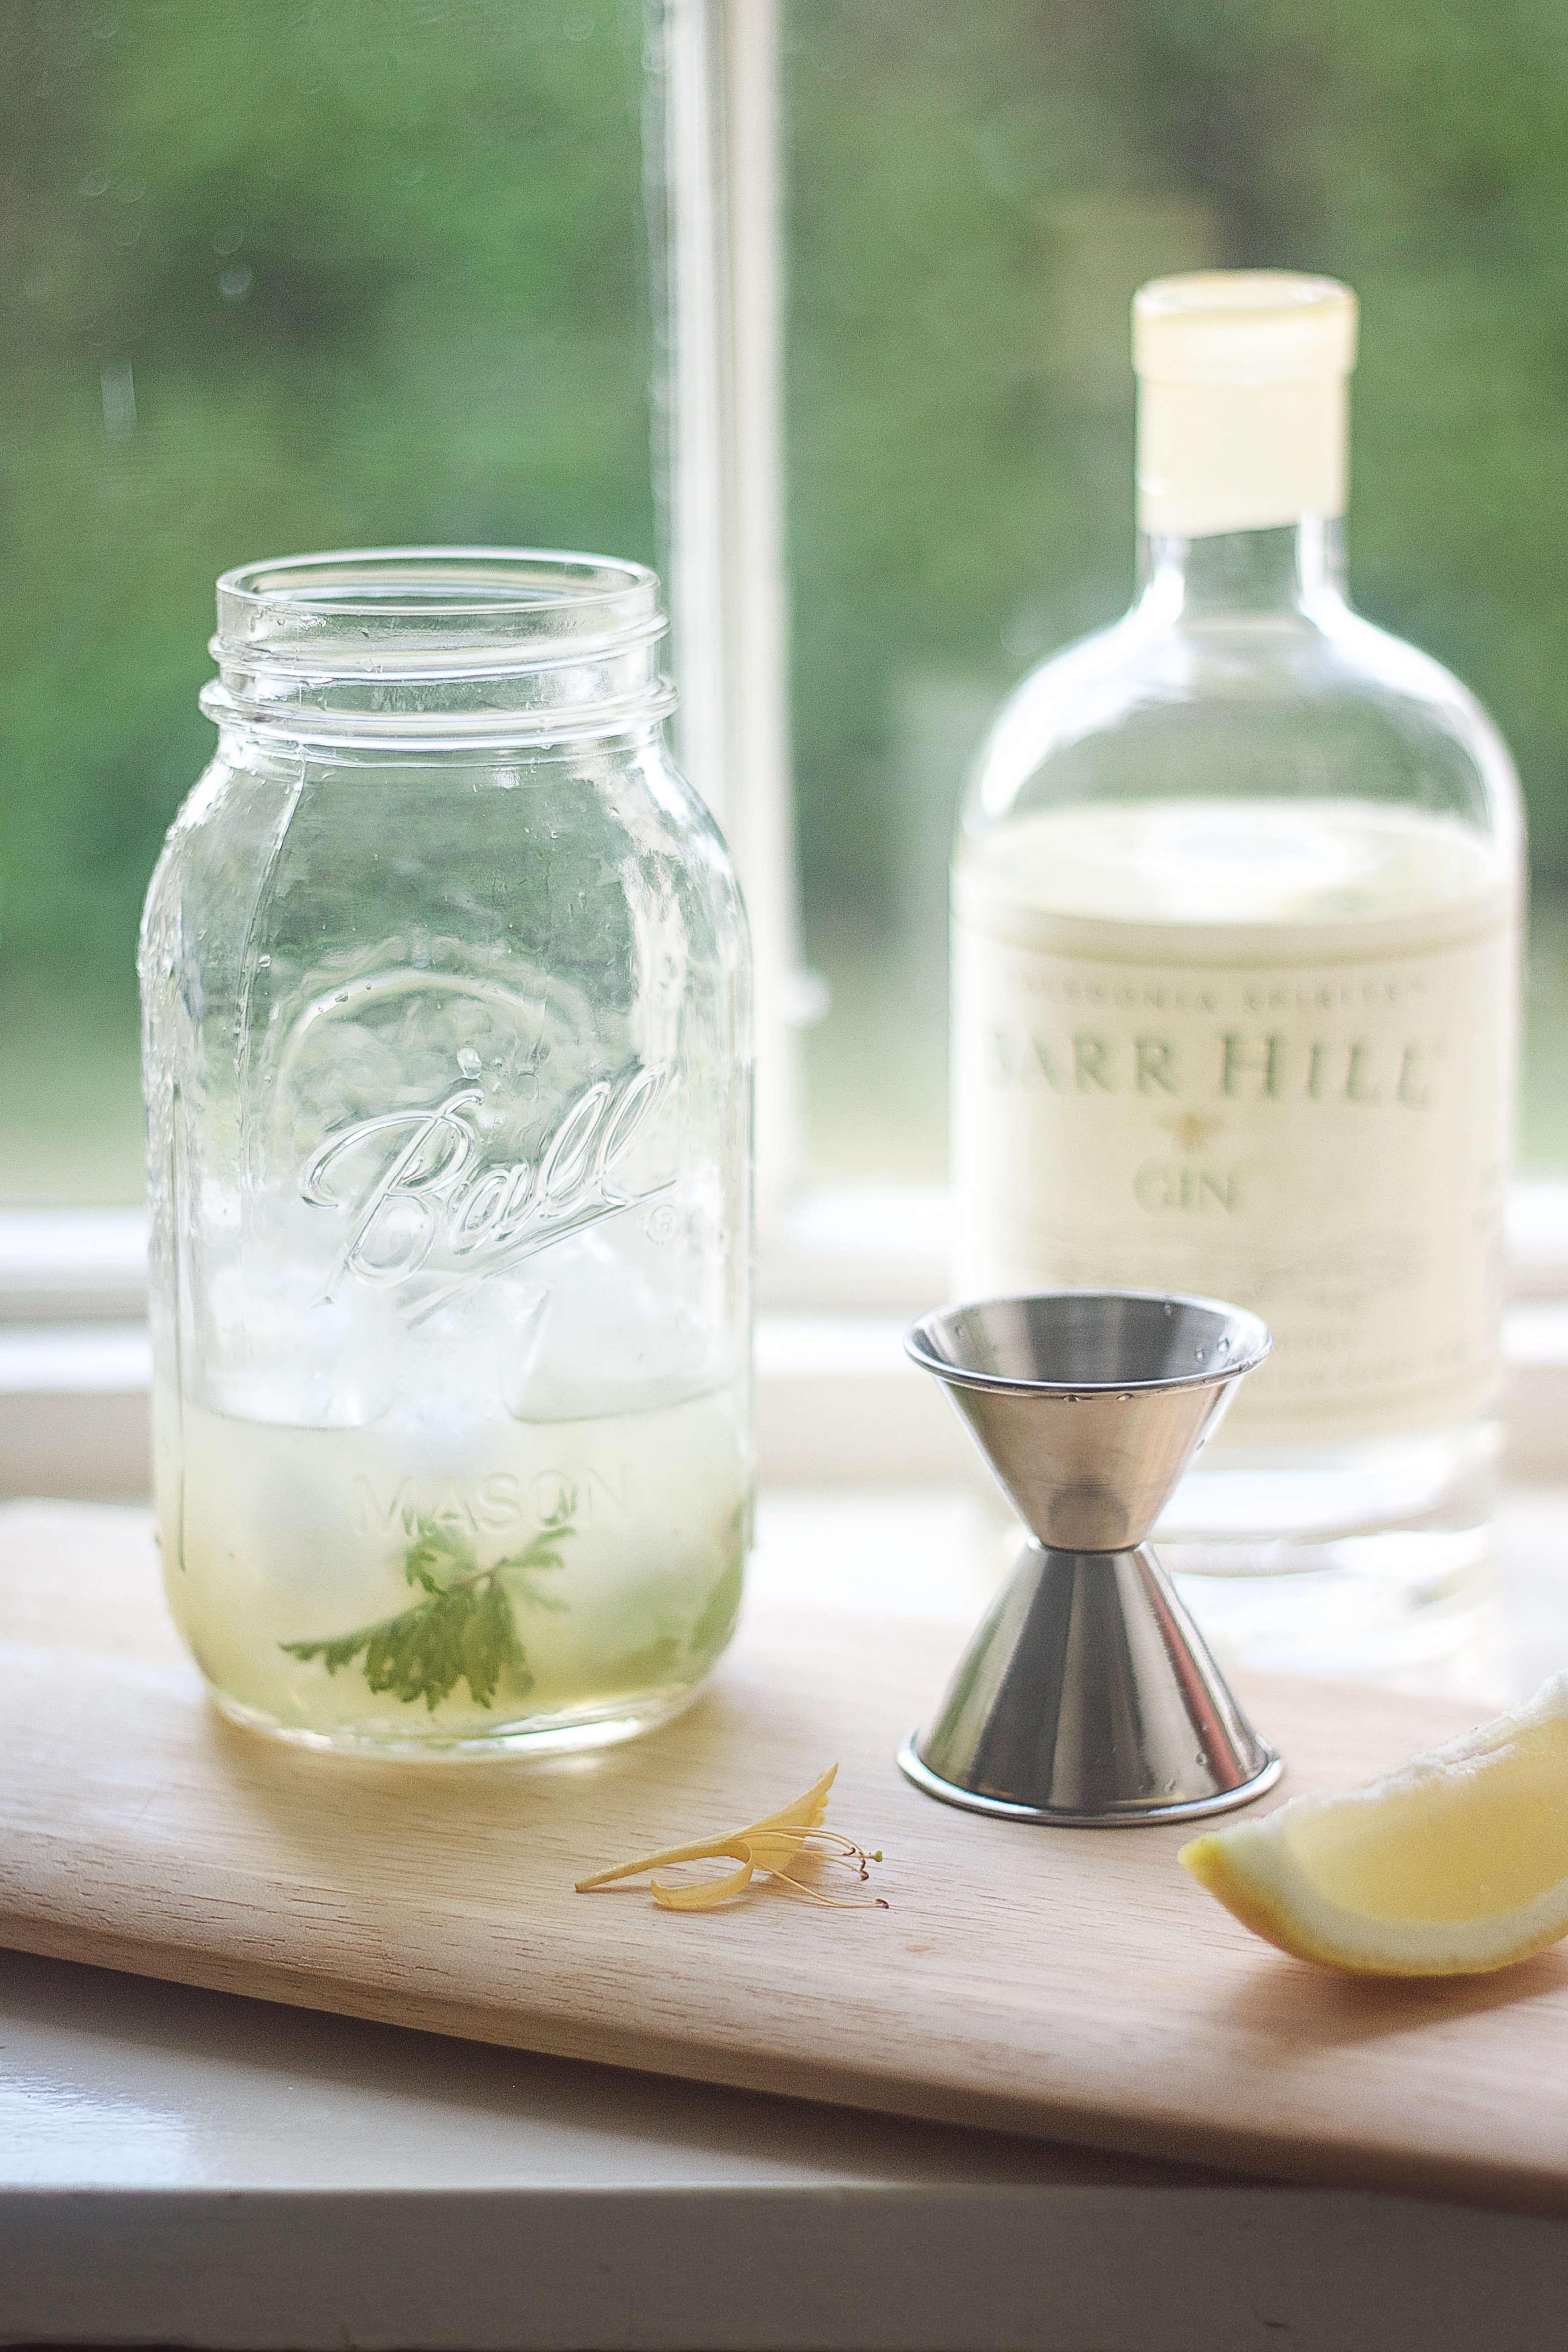 Rose Geranium cocktail, mix, Gardenista